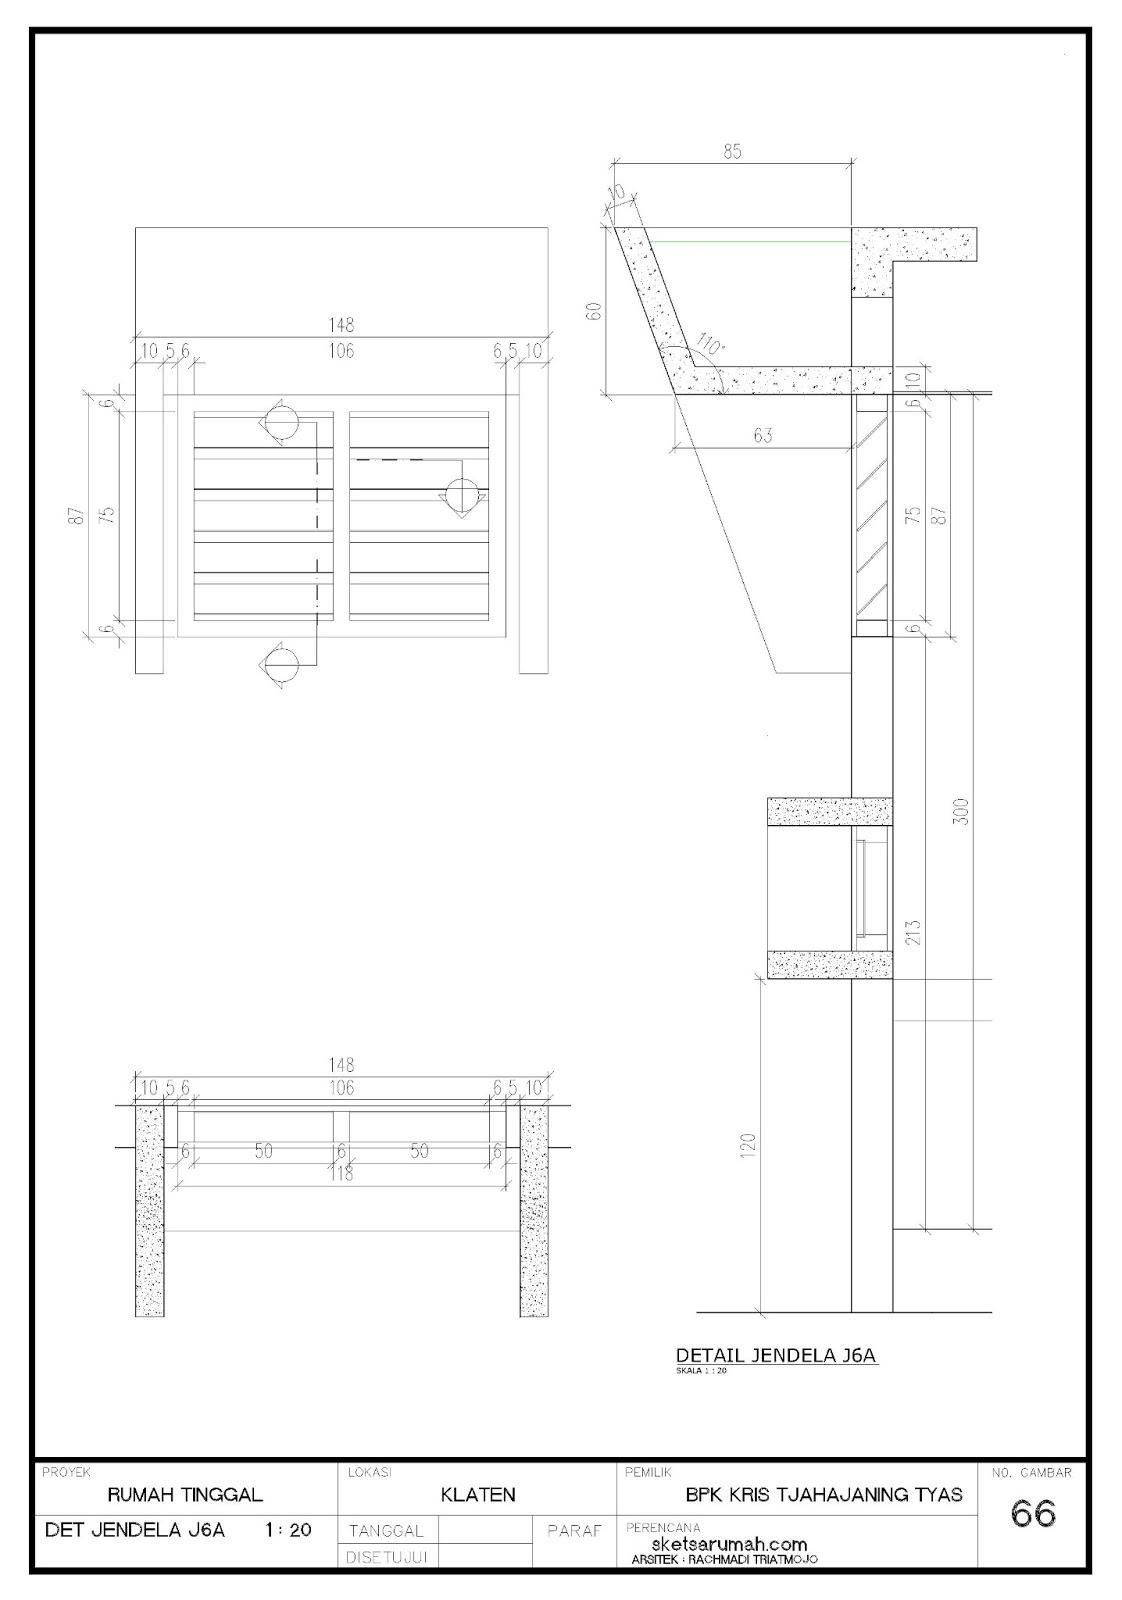 Image Result For Desain Jendela Rumah